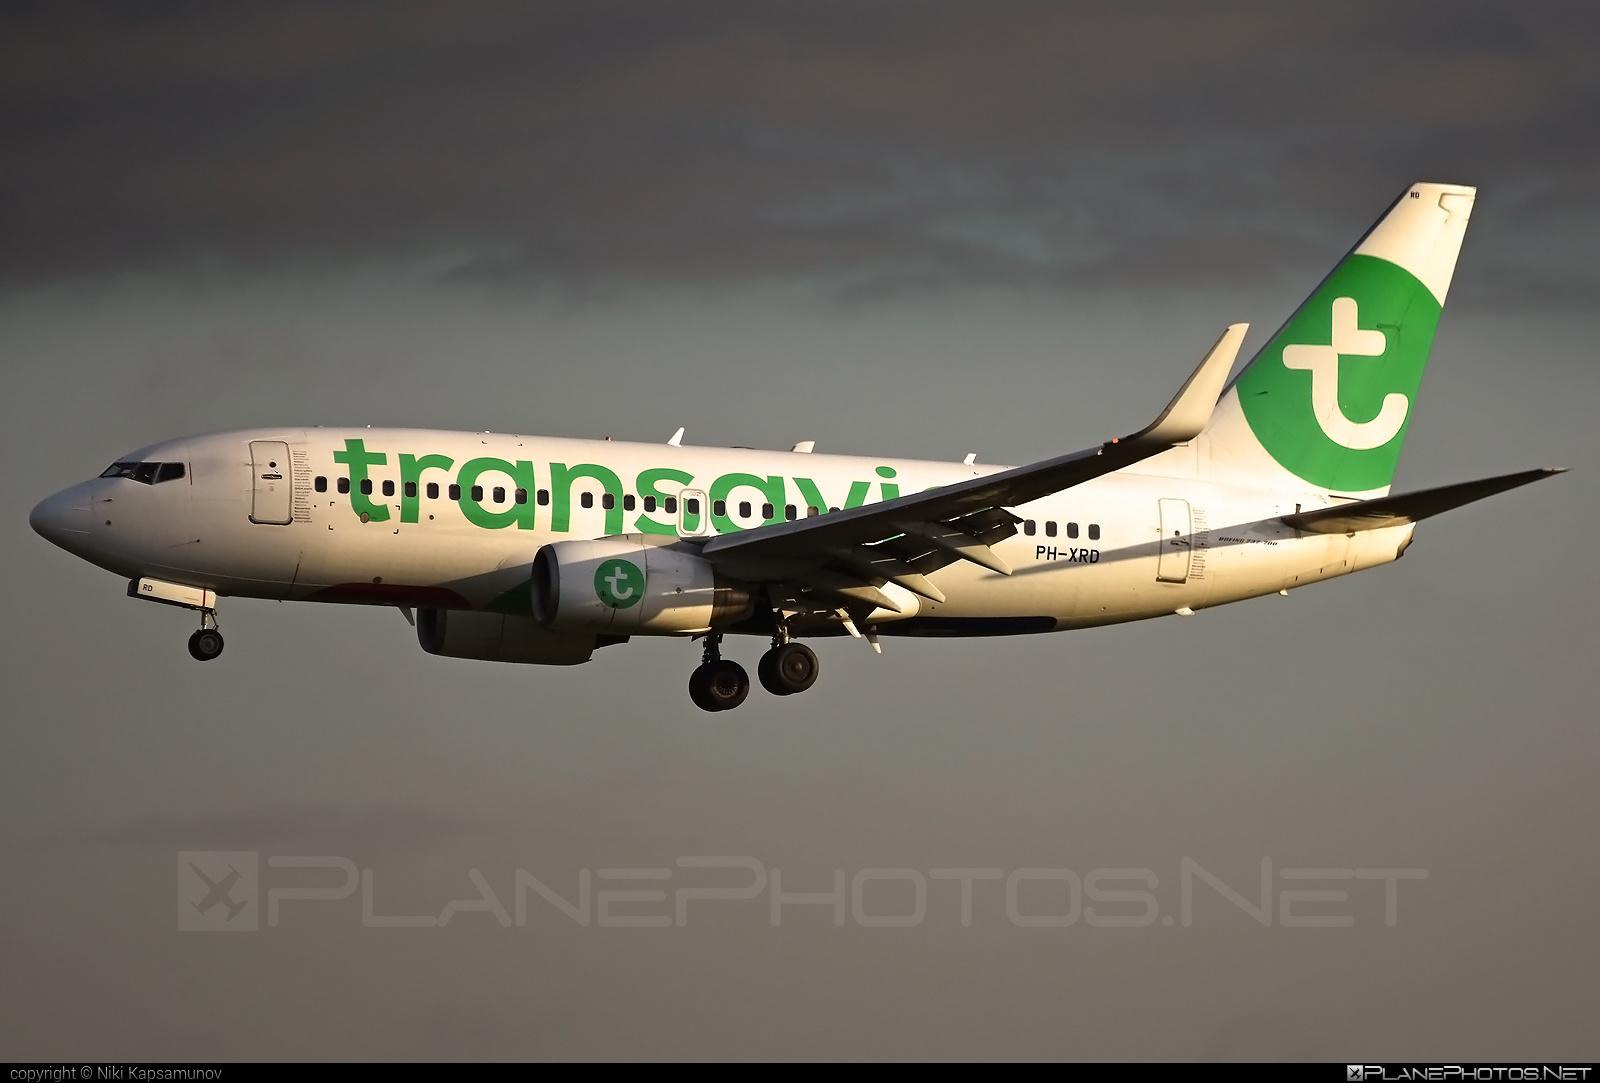 Transavia Airlines Boeing 737-700 - PH-XRD #b737 #b737nextgen #b737ng #boeing #boeing737 #transavia #transaviaairlines